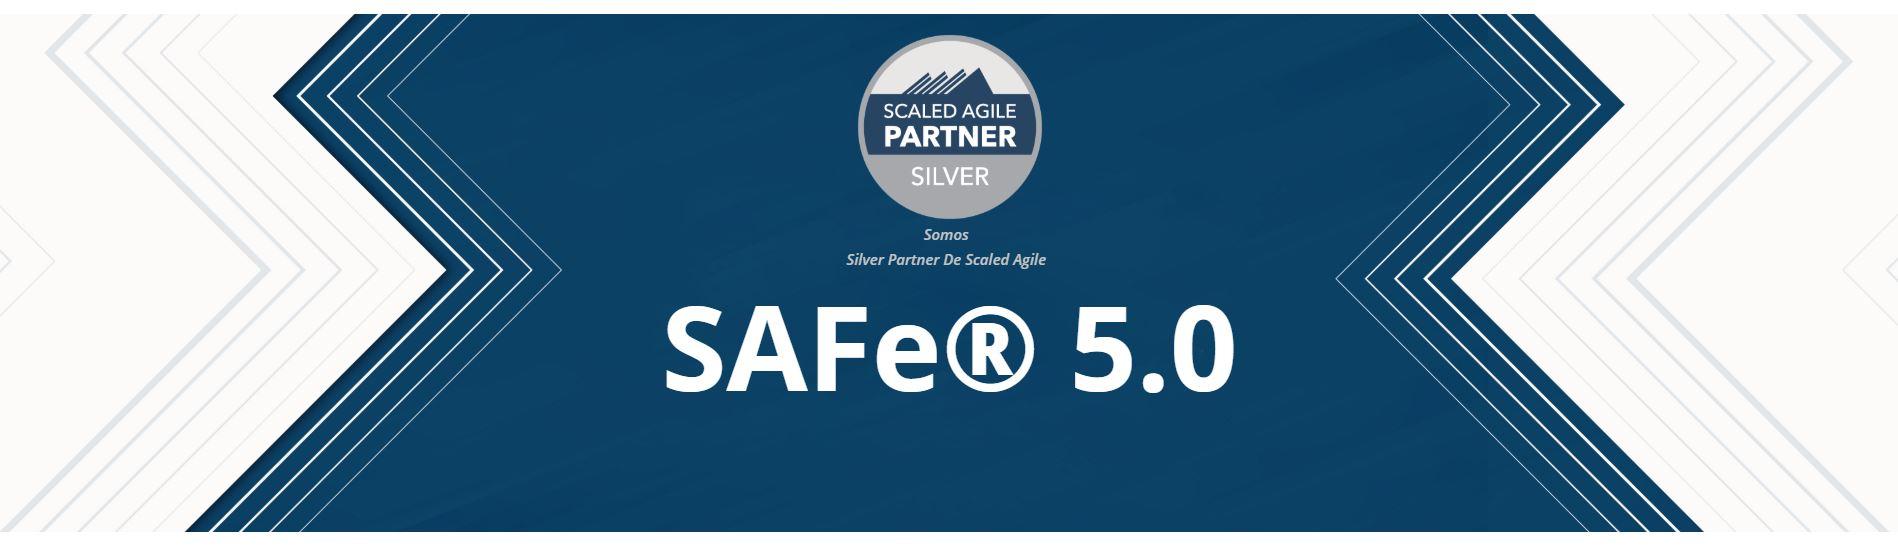 SAFE 5.0 SILVER